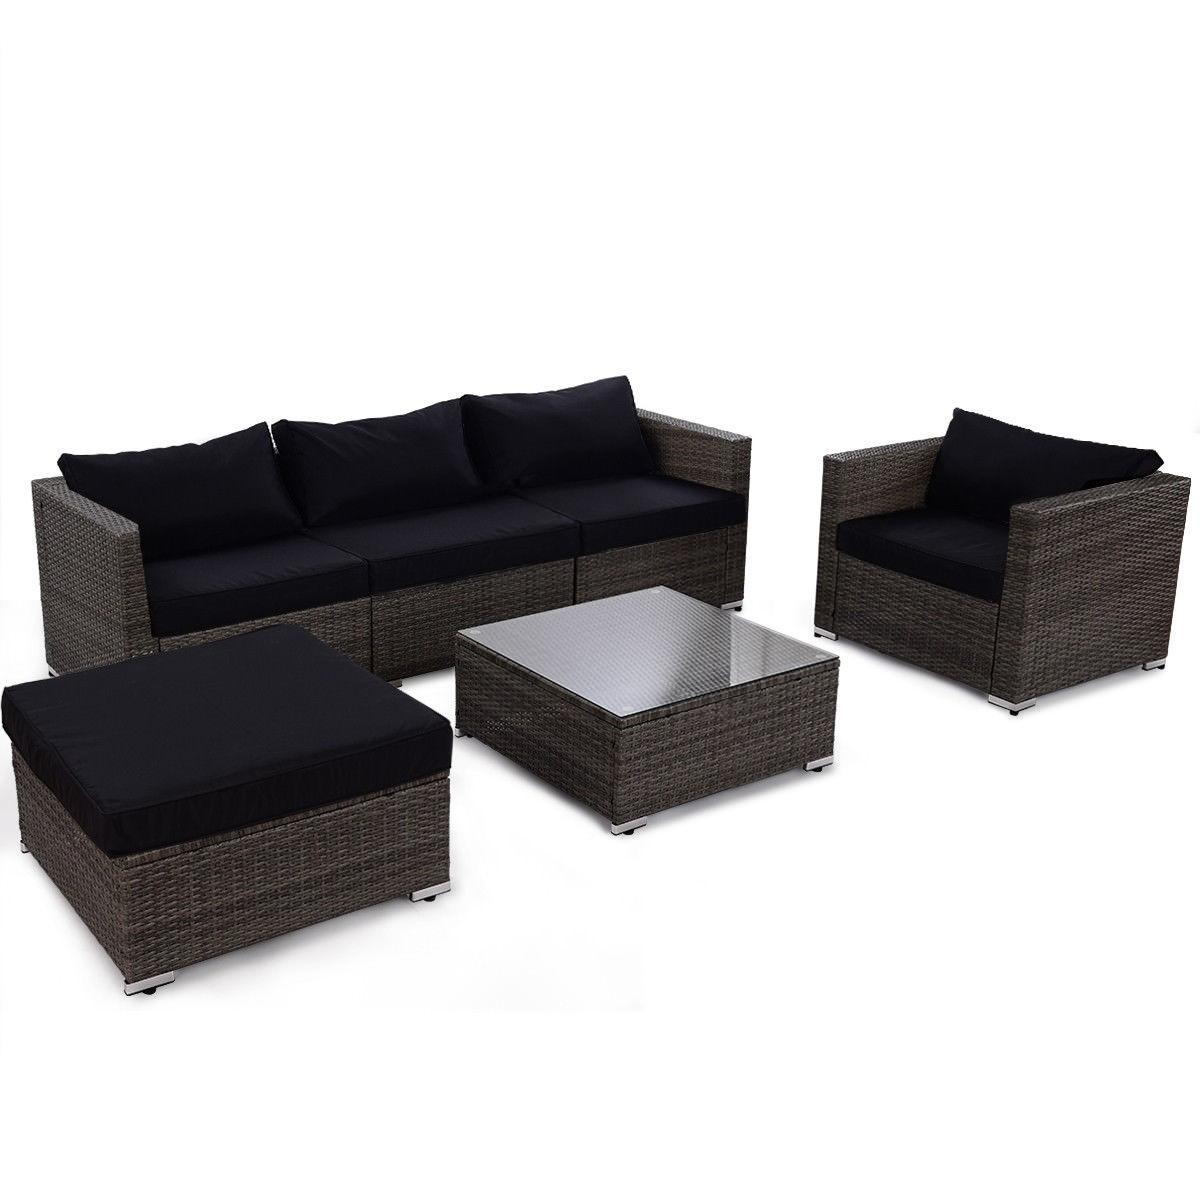 6 pcs Patio Rattan Wicker Sectional Furniture Set w/ Black Cushion